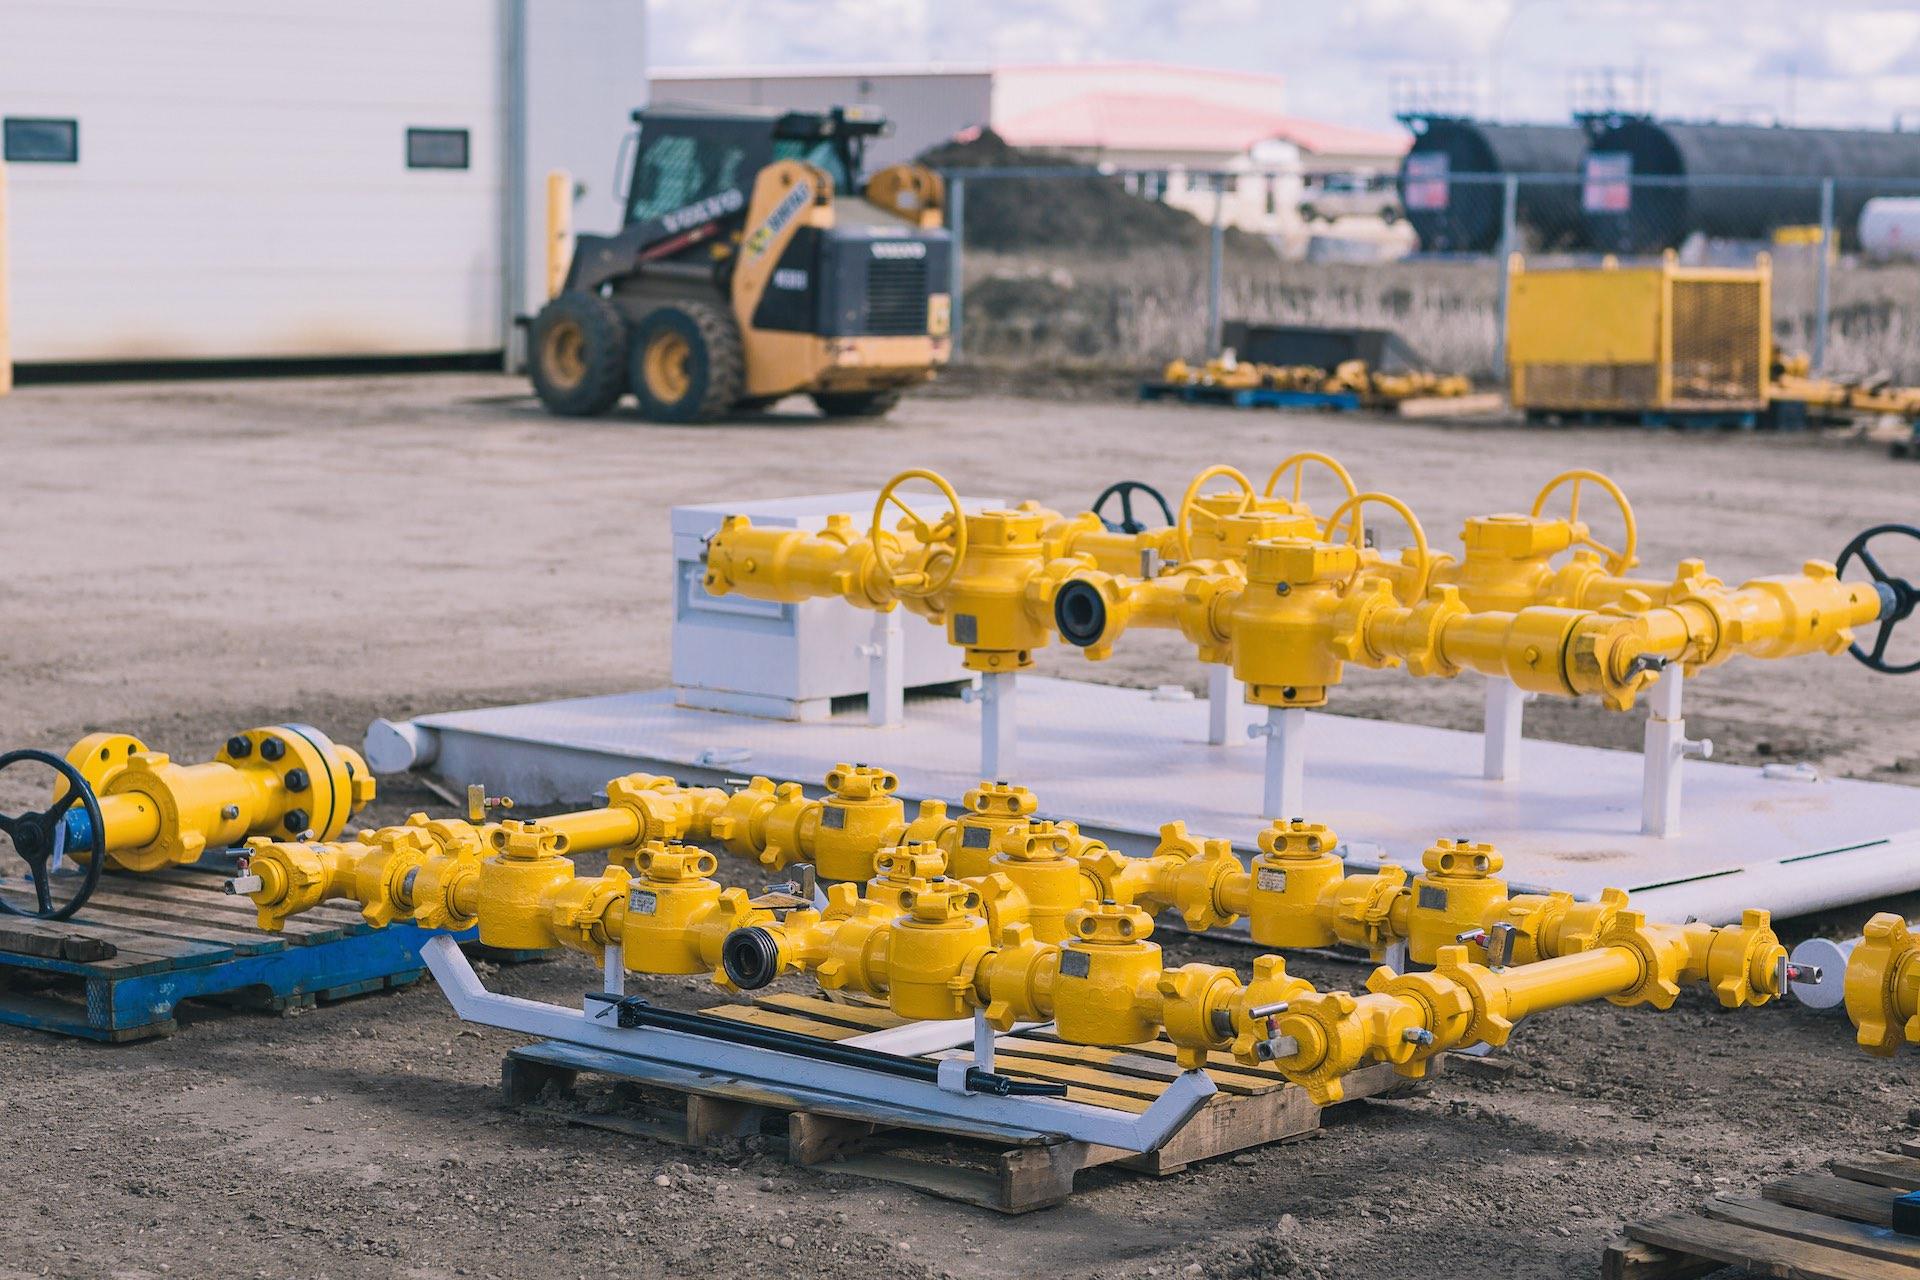 Oilfield rental equipment, 10k rentals, oilfield equiment